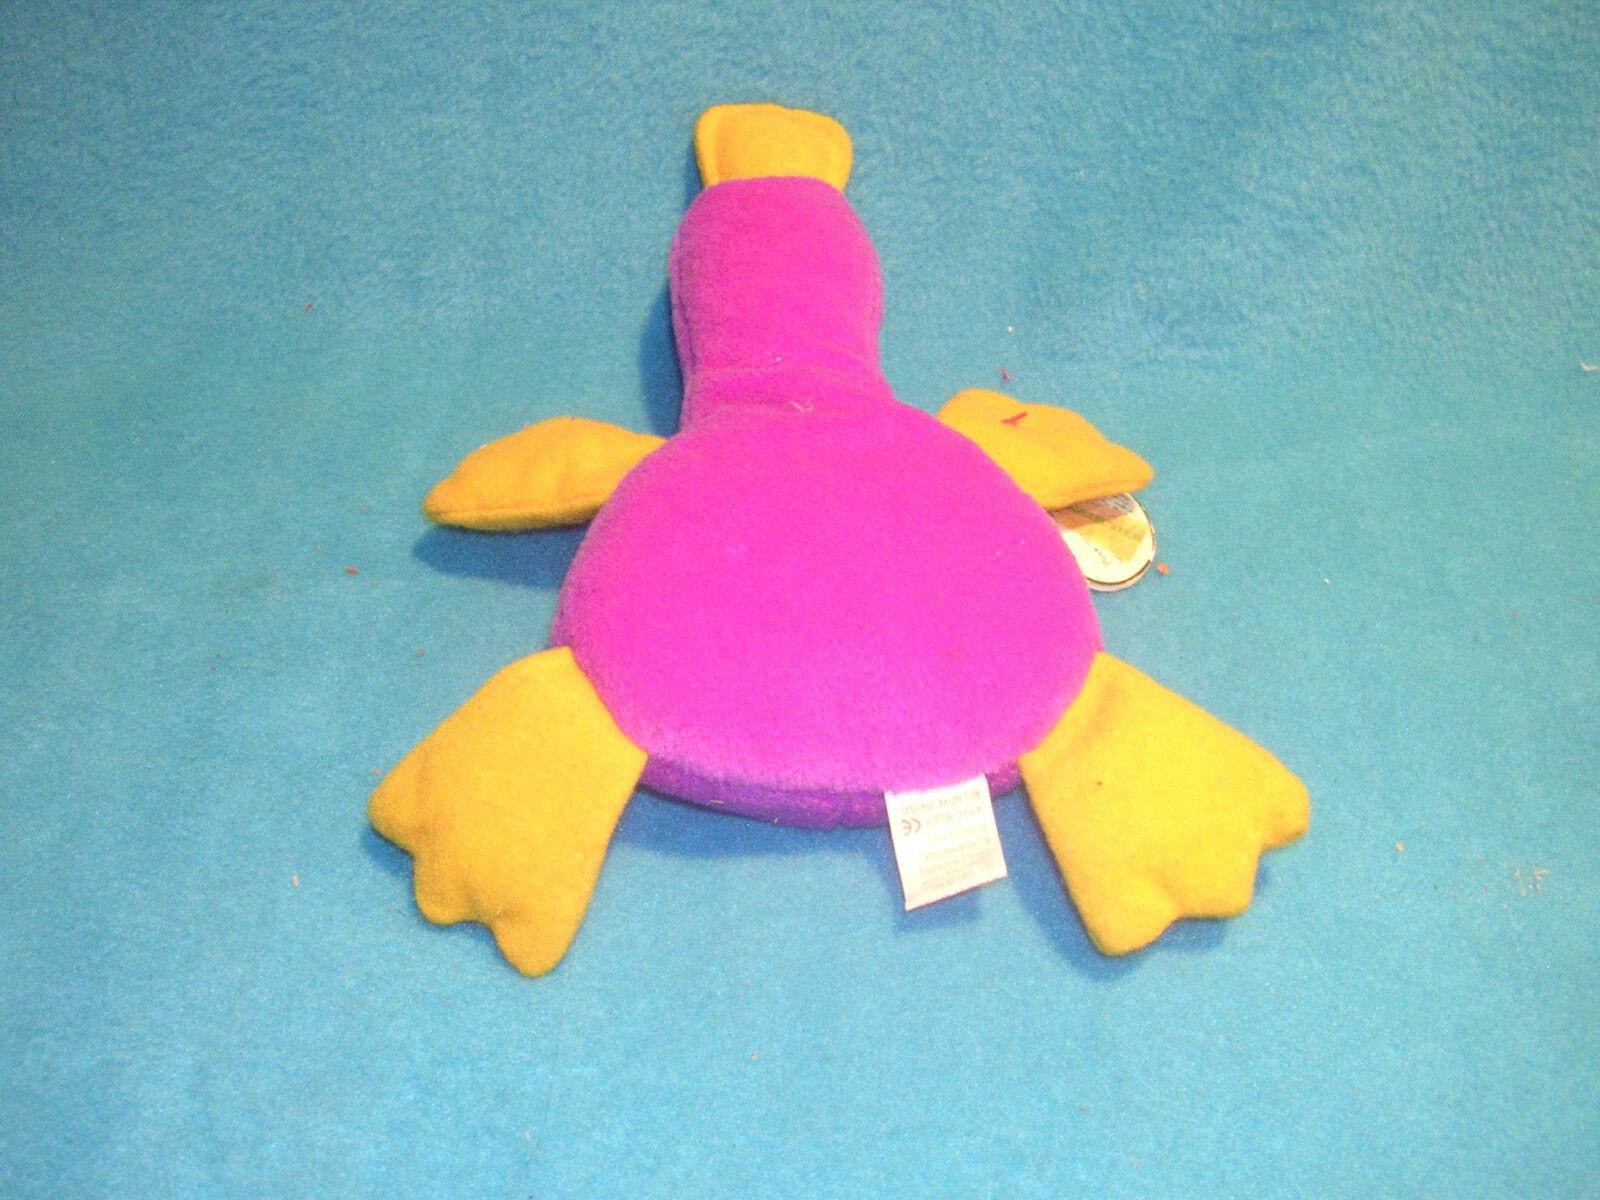 Patti Platypus Style 4025 Birth 01.06.93 with tags tags tags Original Beanie Baby w  Error 9a18ff